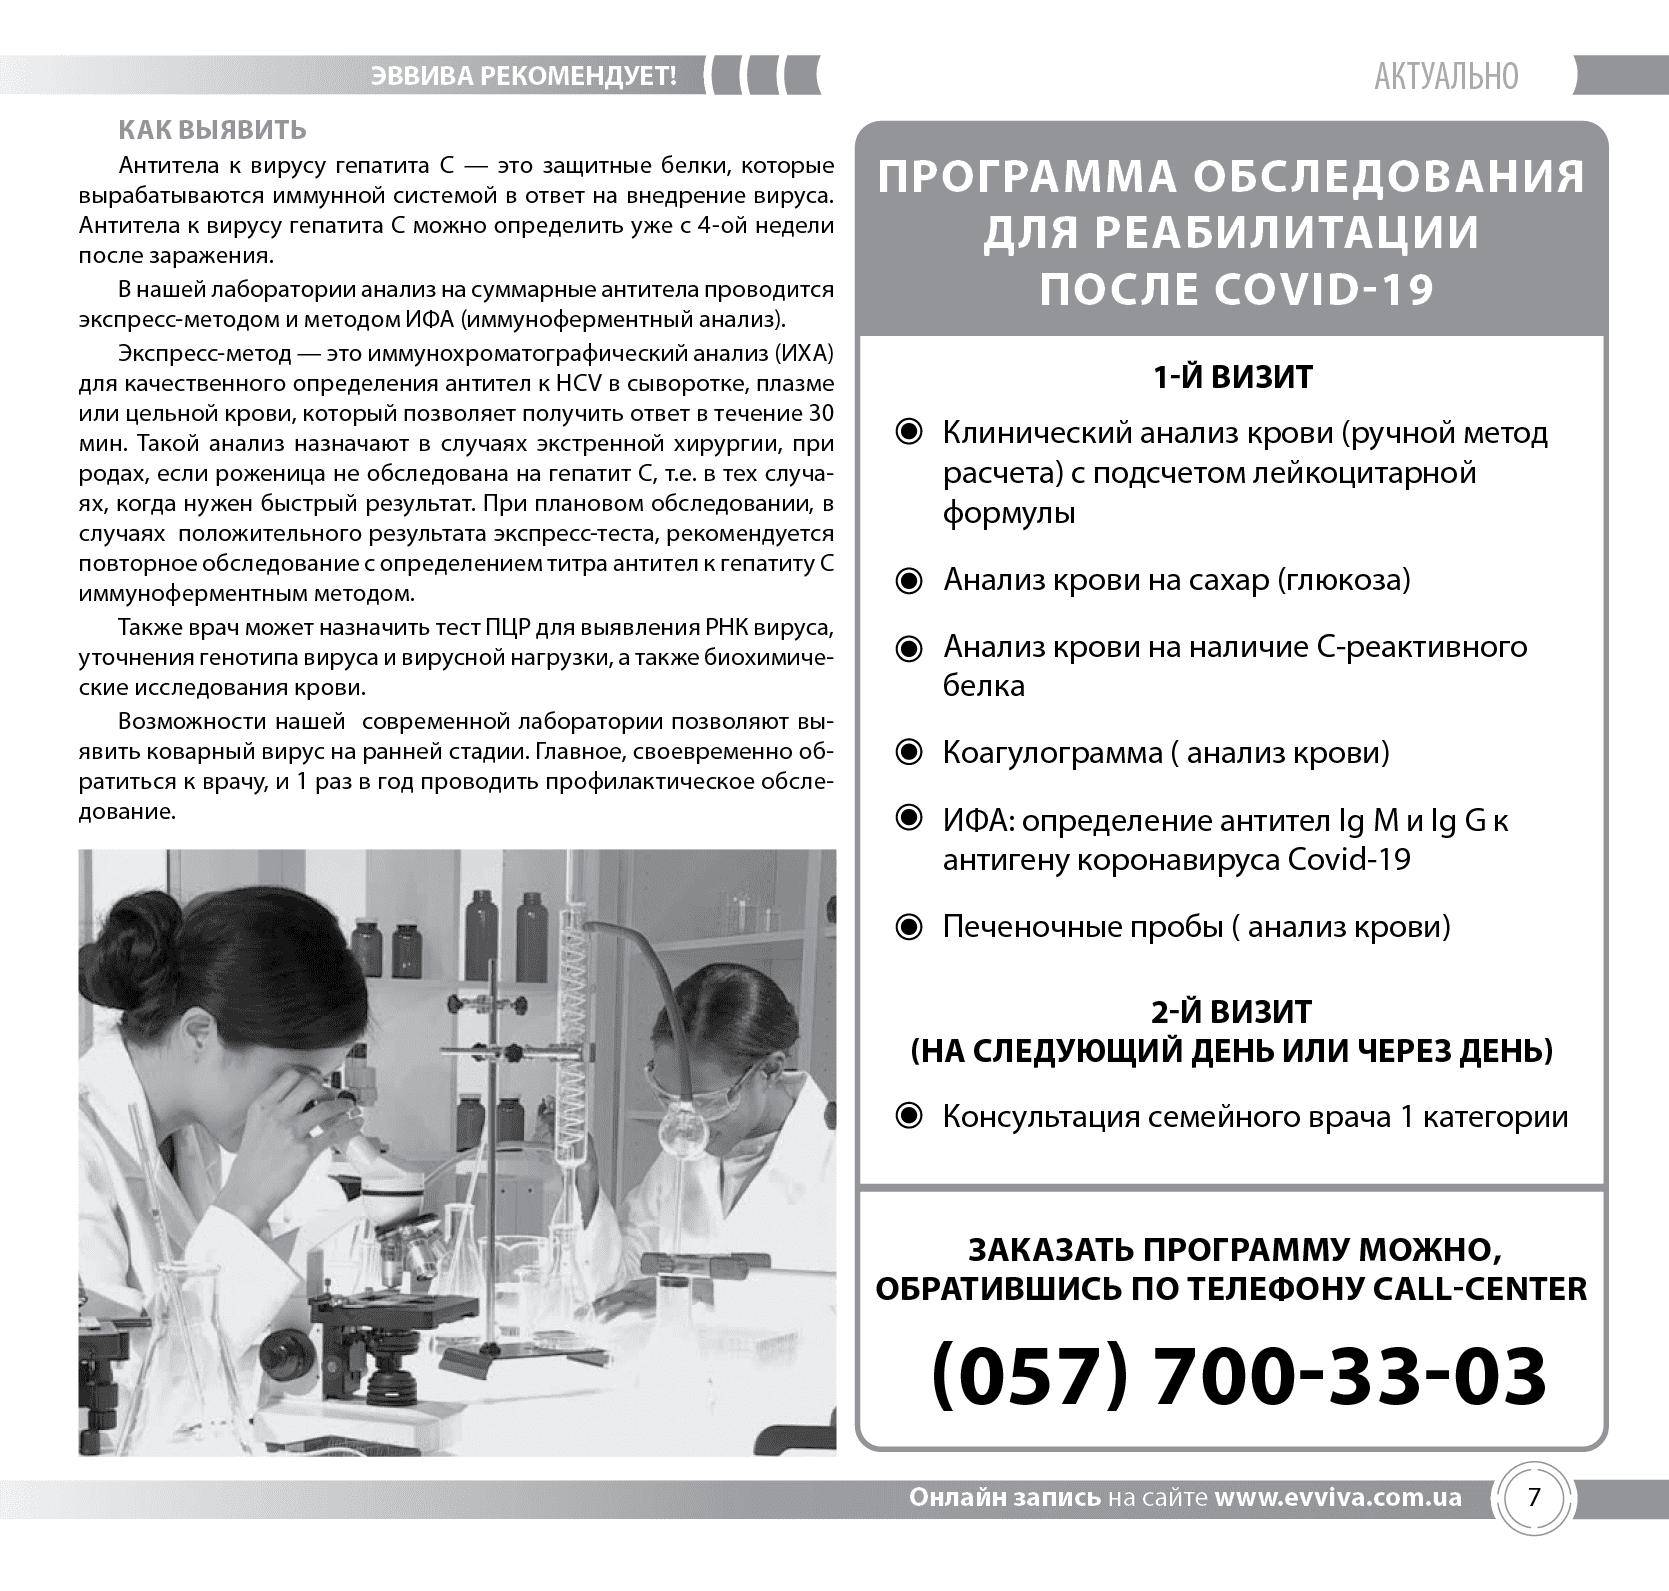 evviva-zhurnal-118-page7